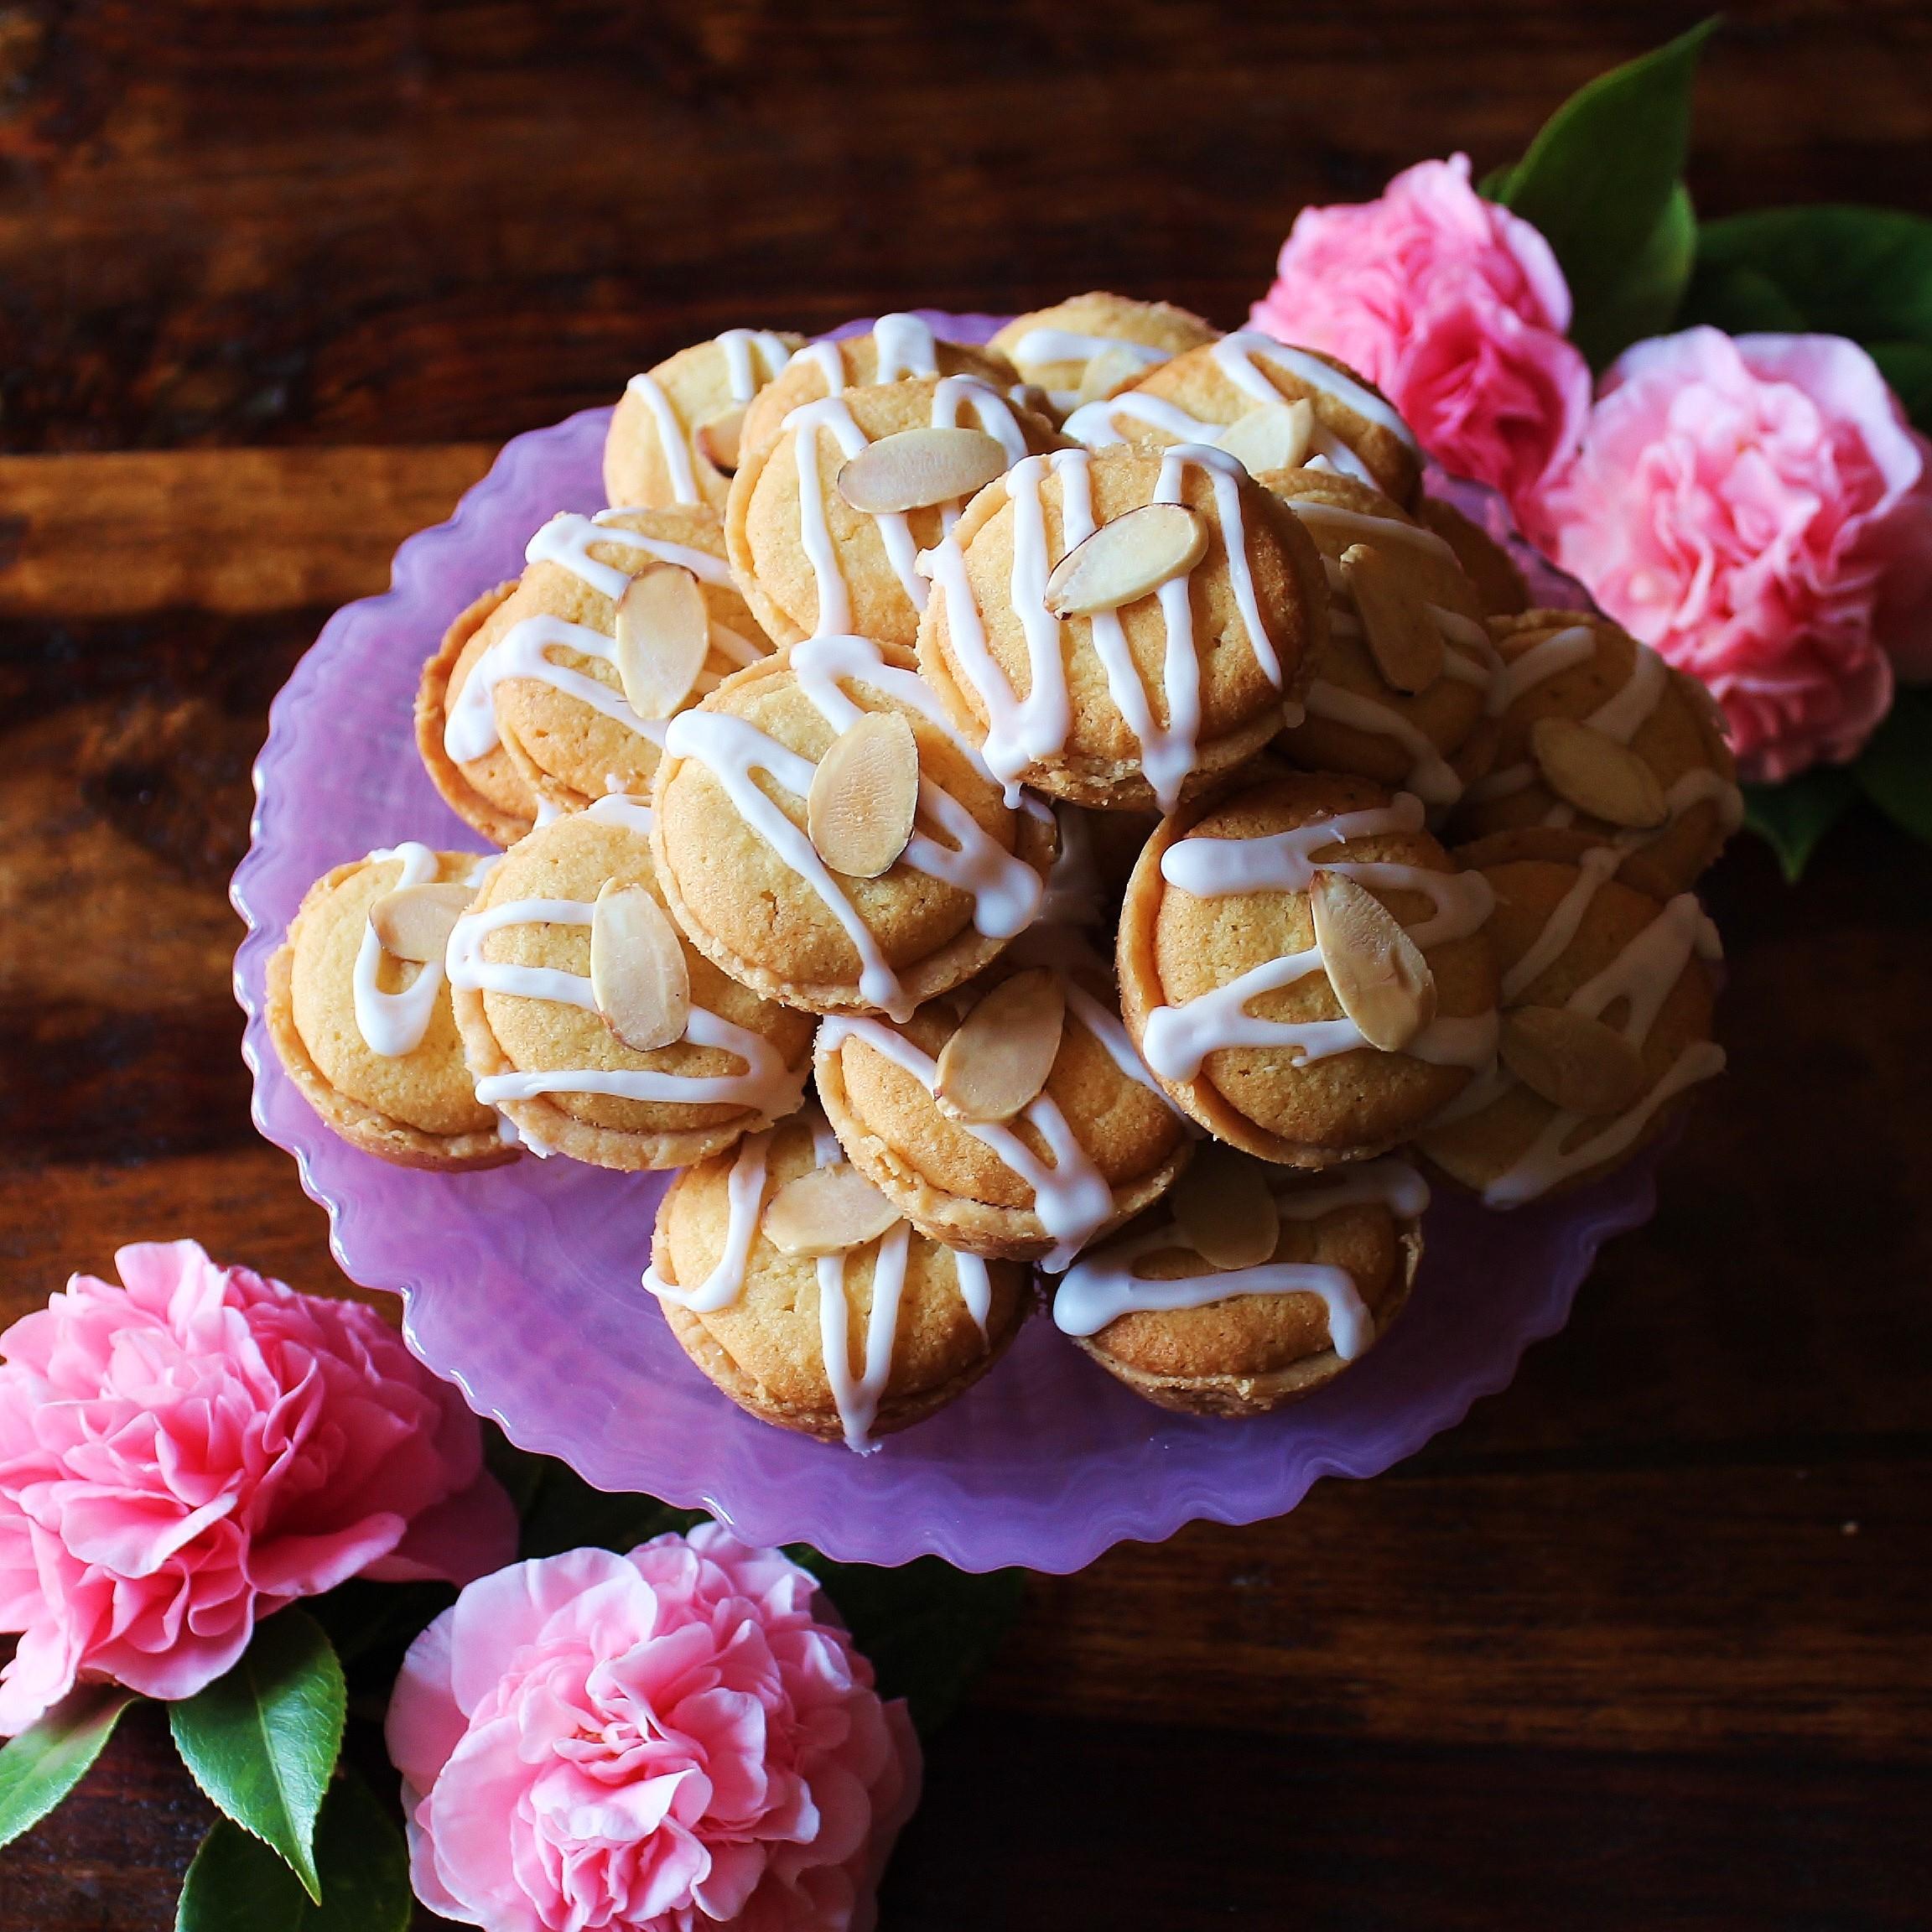 A platter of Raspeberry Bakewell Mini Tarts